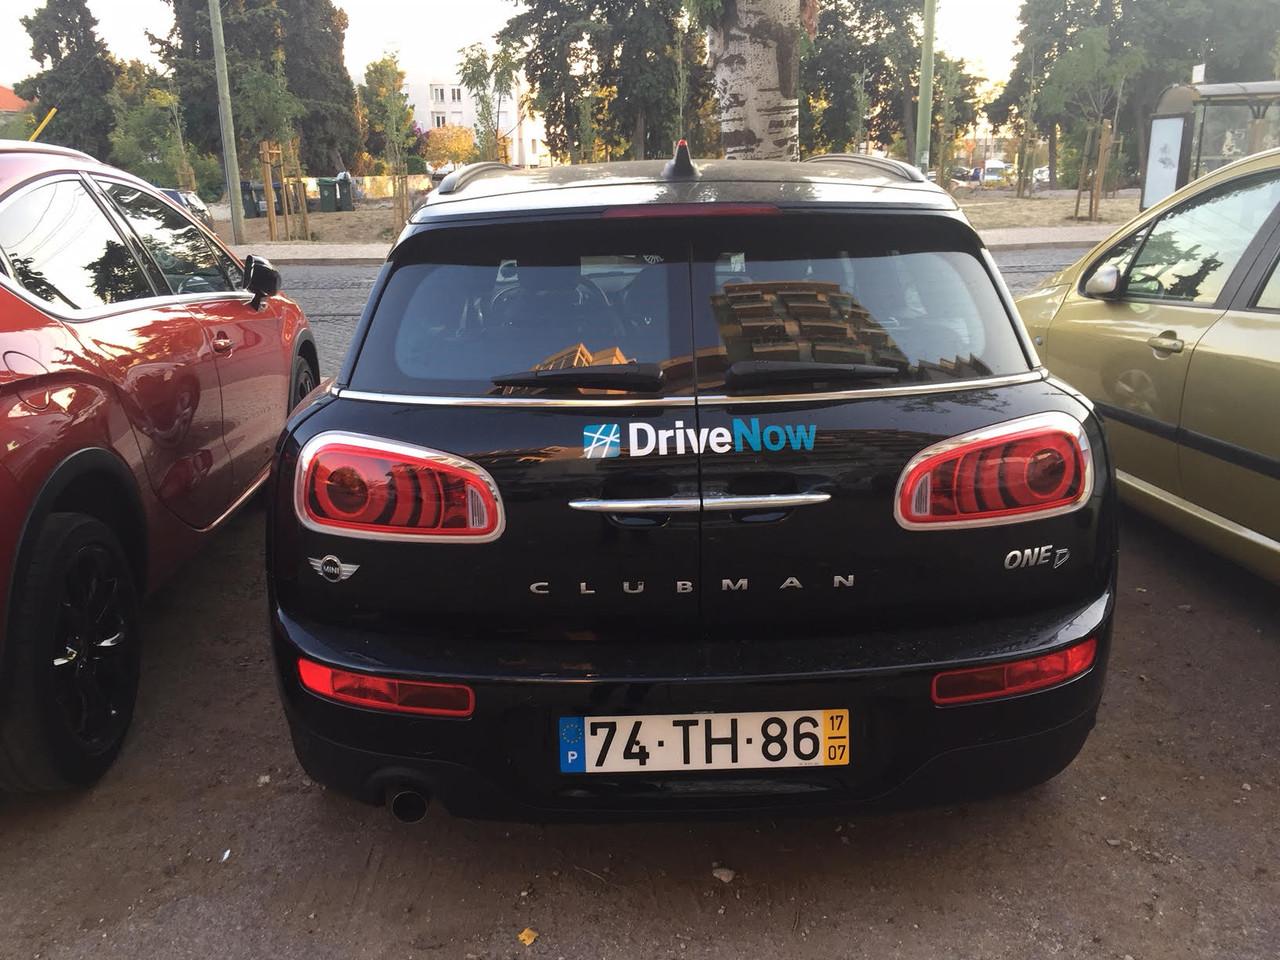 drive now like a man 1.jpg